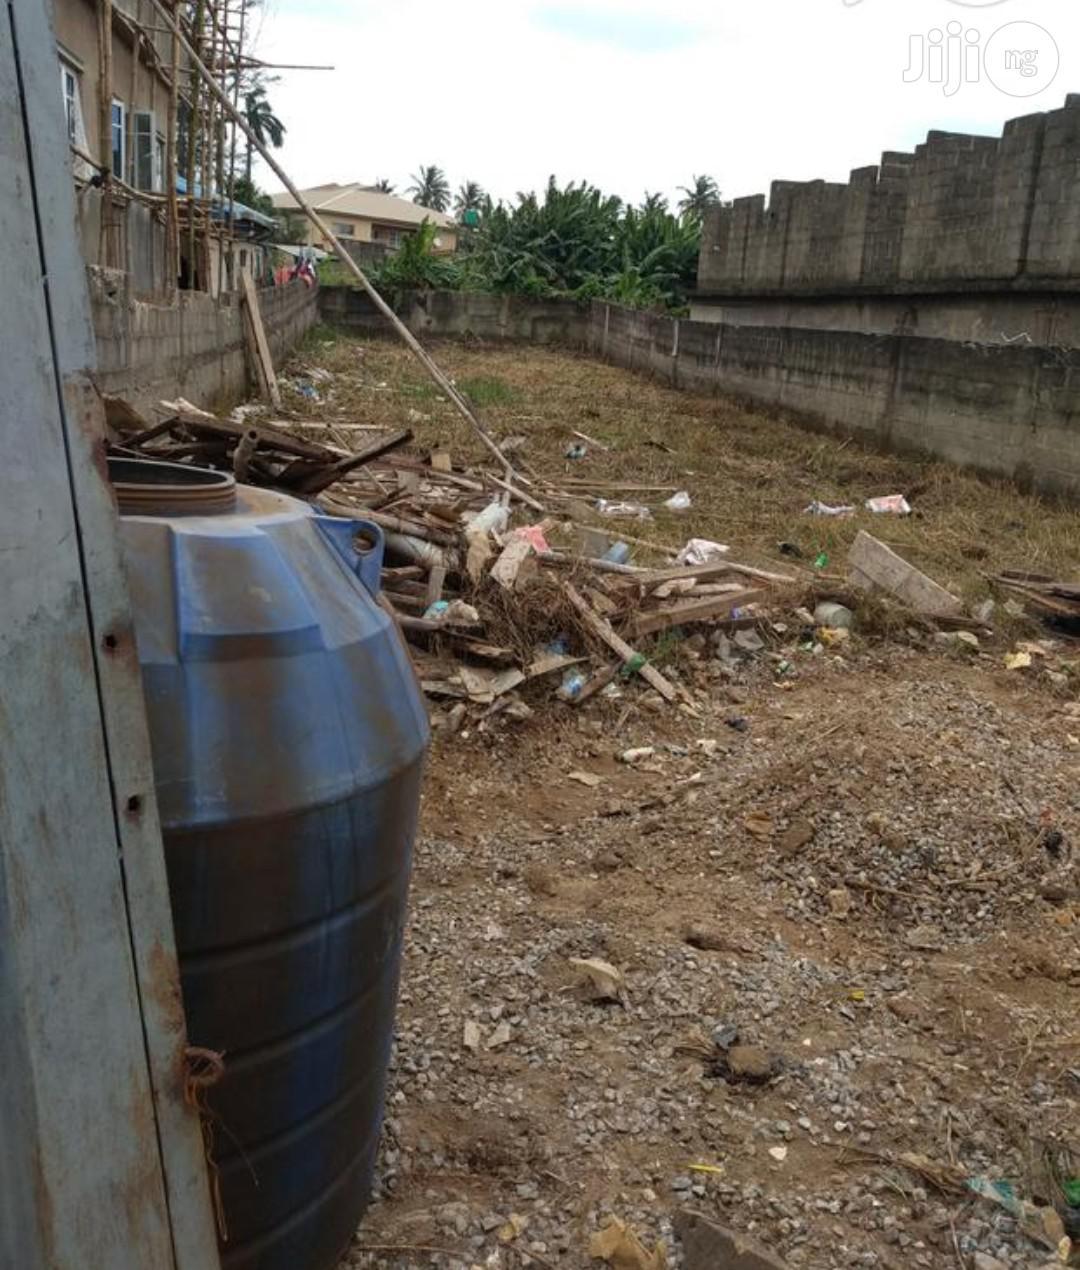 Virgin Land of 400sqm for Sale at Sholuyi Gbagada. | Land & Plots For Sale for sale in Gbagada, Lagos State, Nigeria